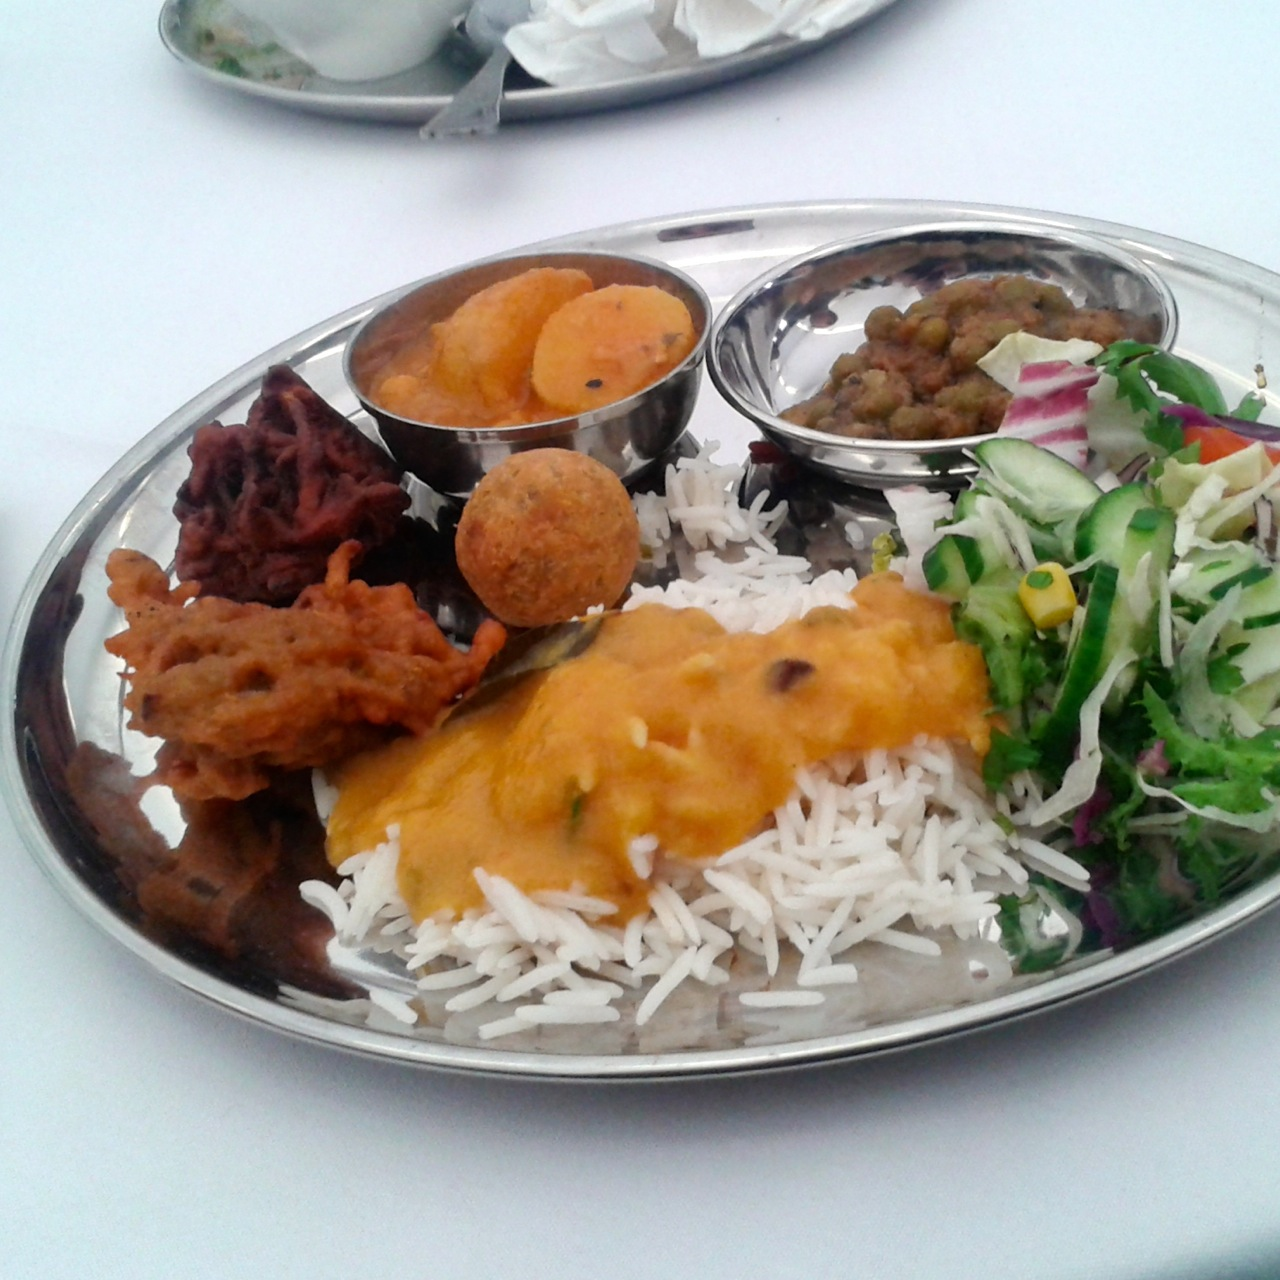 Vegan Wedding Food: Vegan Food At A Wedding